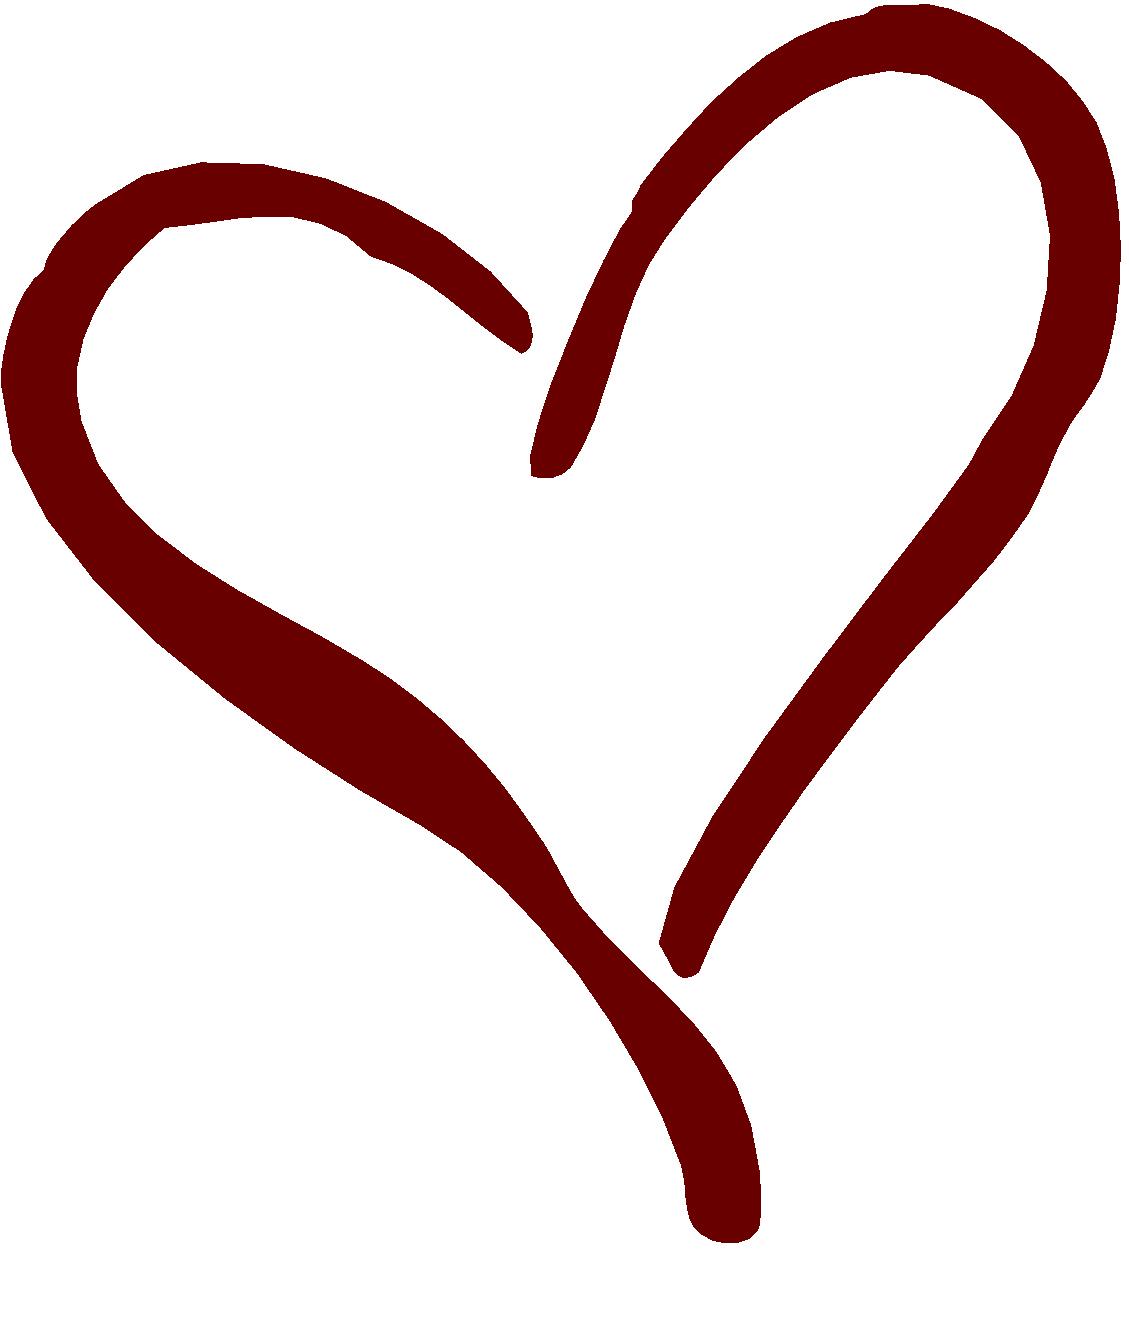 Hearts heart clip art images 5